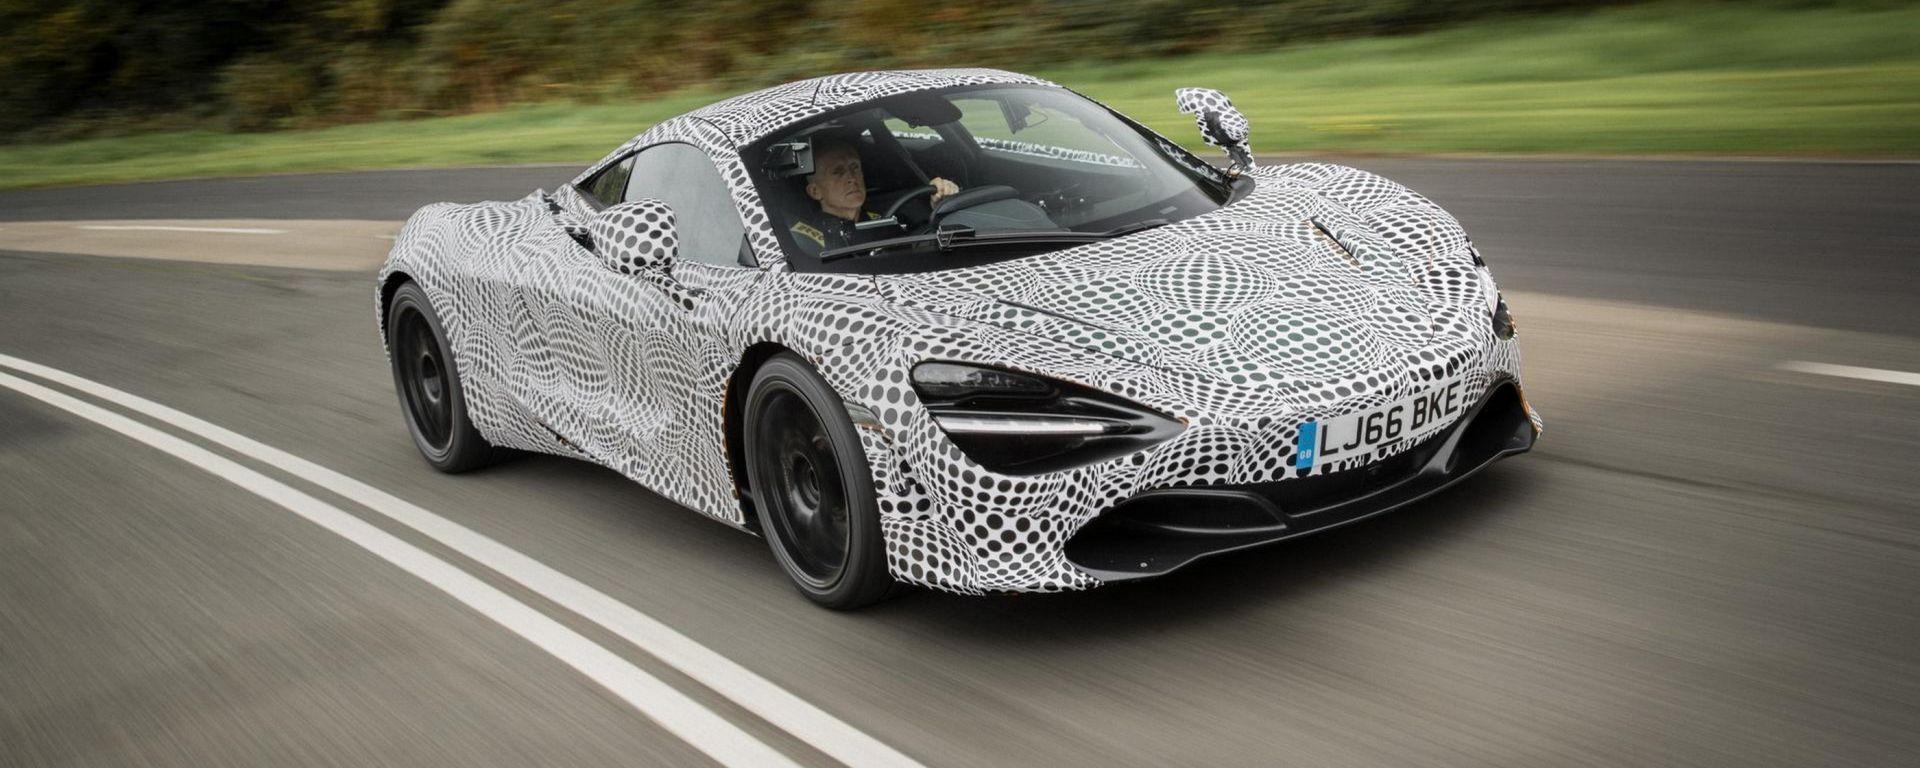 McLaren BP23: ecco l'erede della P1, sarà ibrida da 400 km/h